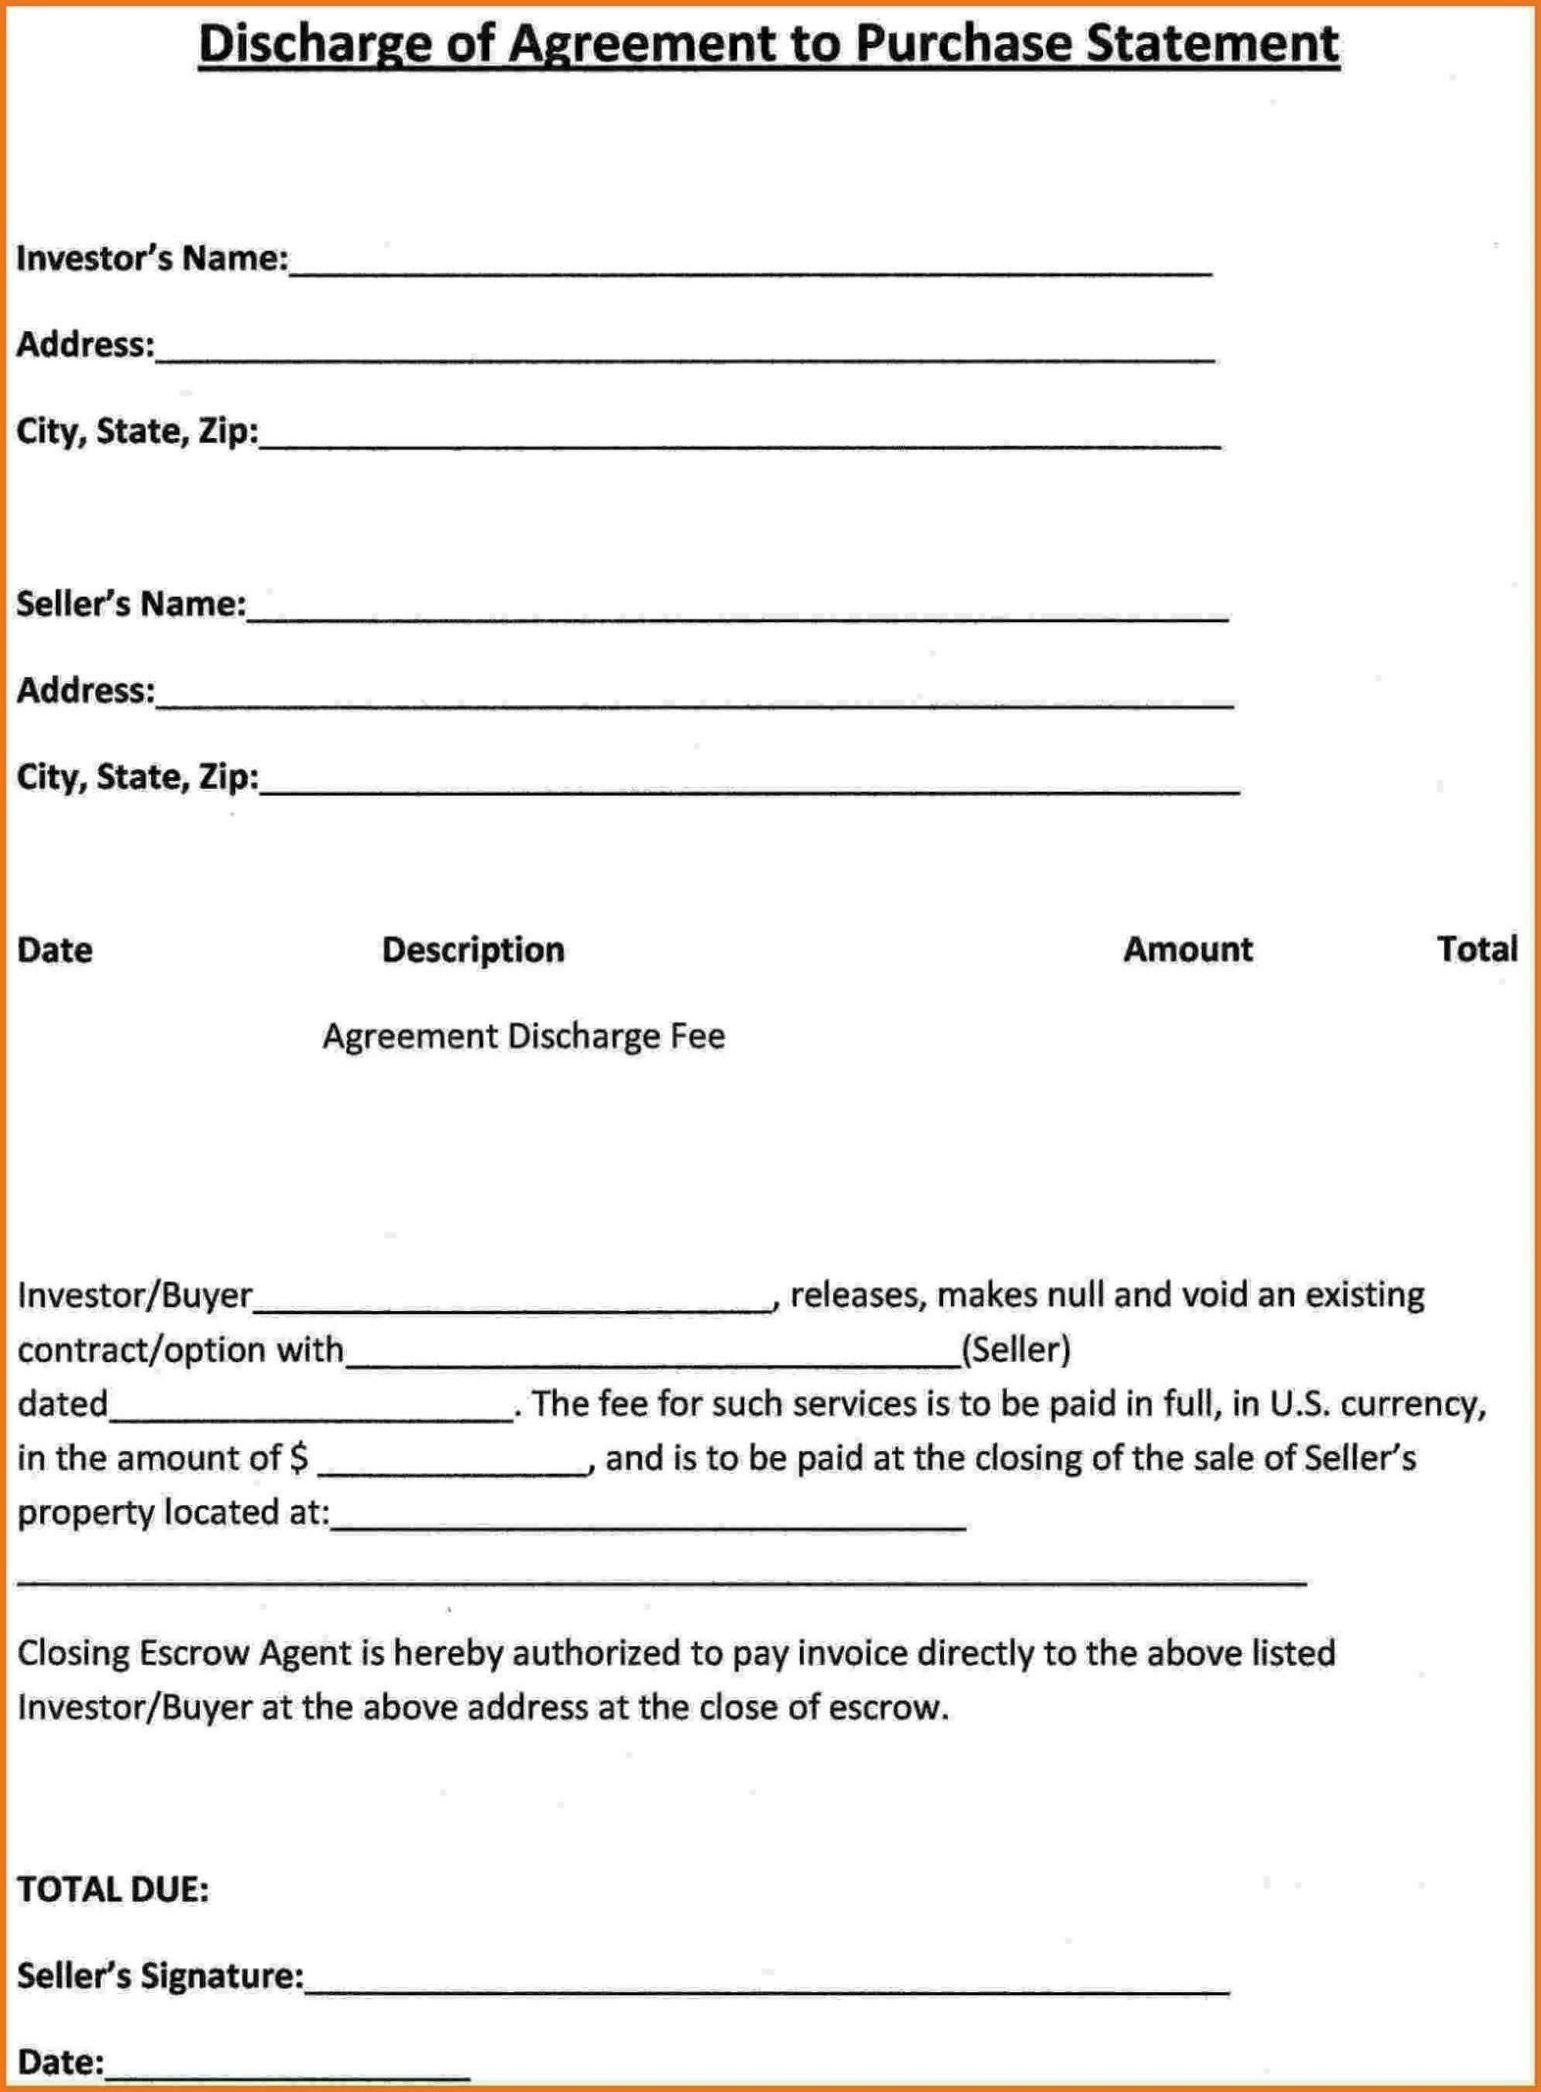 bridge loan agreement template - home purchase agreement template free sampletemplatess